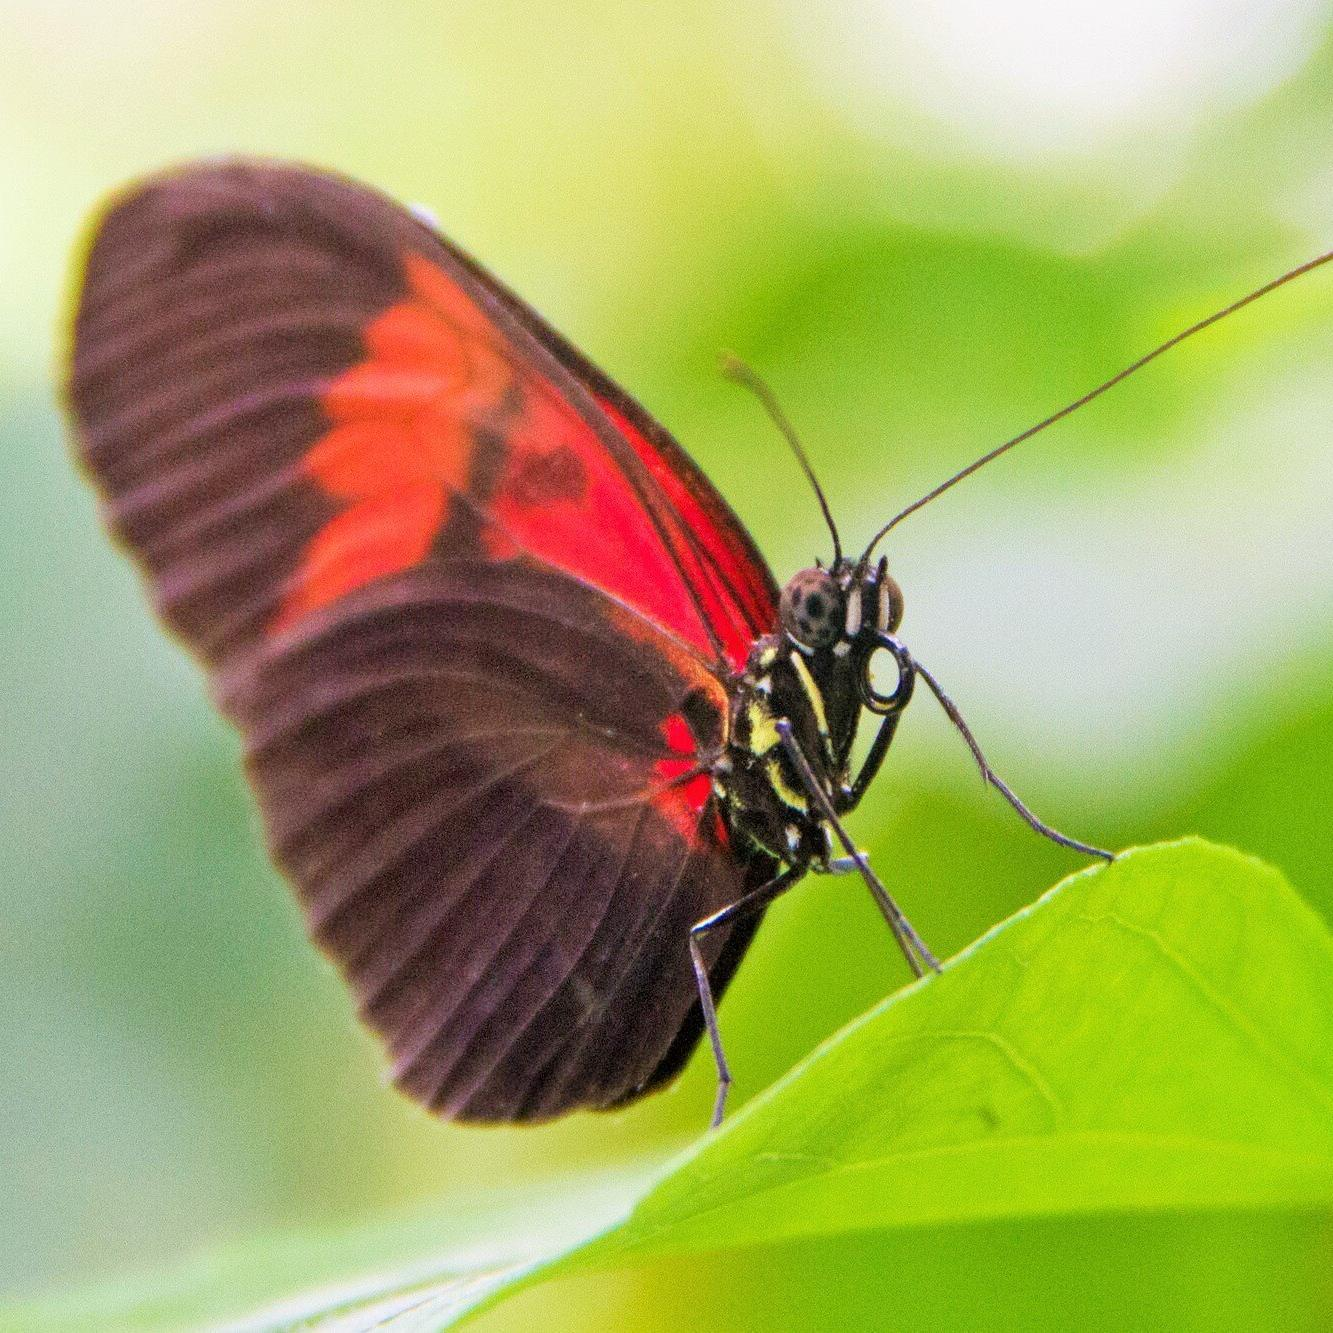 Schmetterling © Usedom Tourismus GmbH/Andreas Dumke